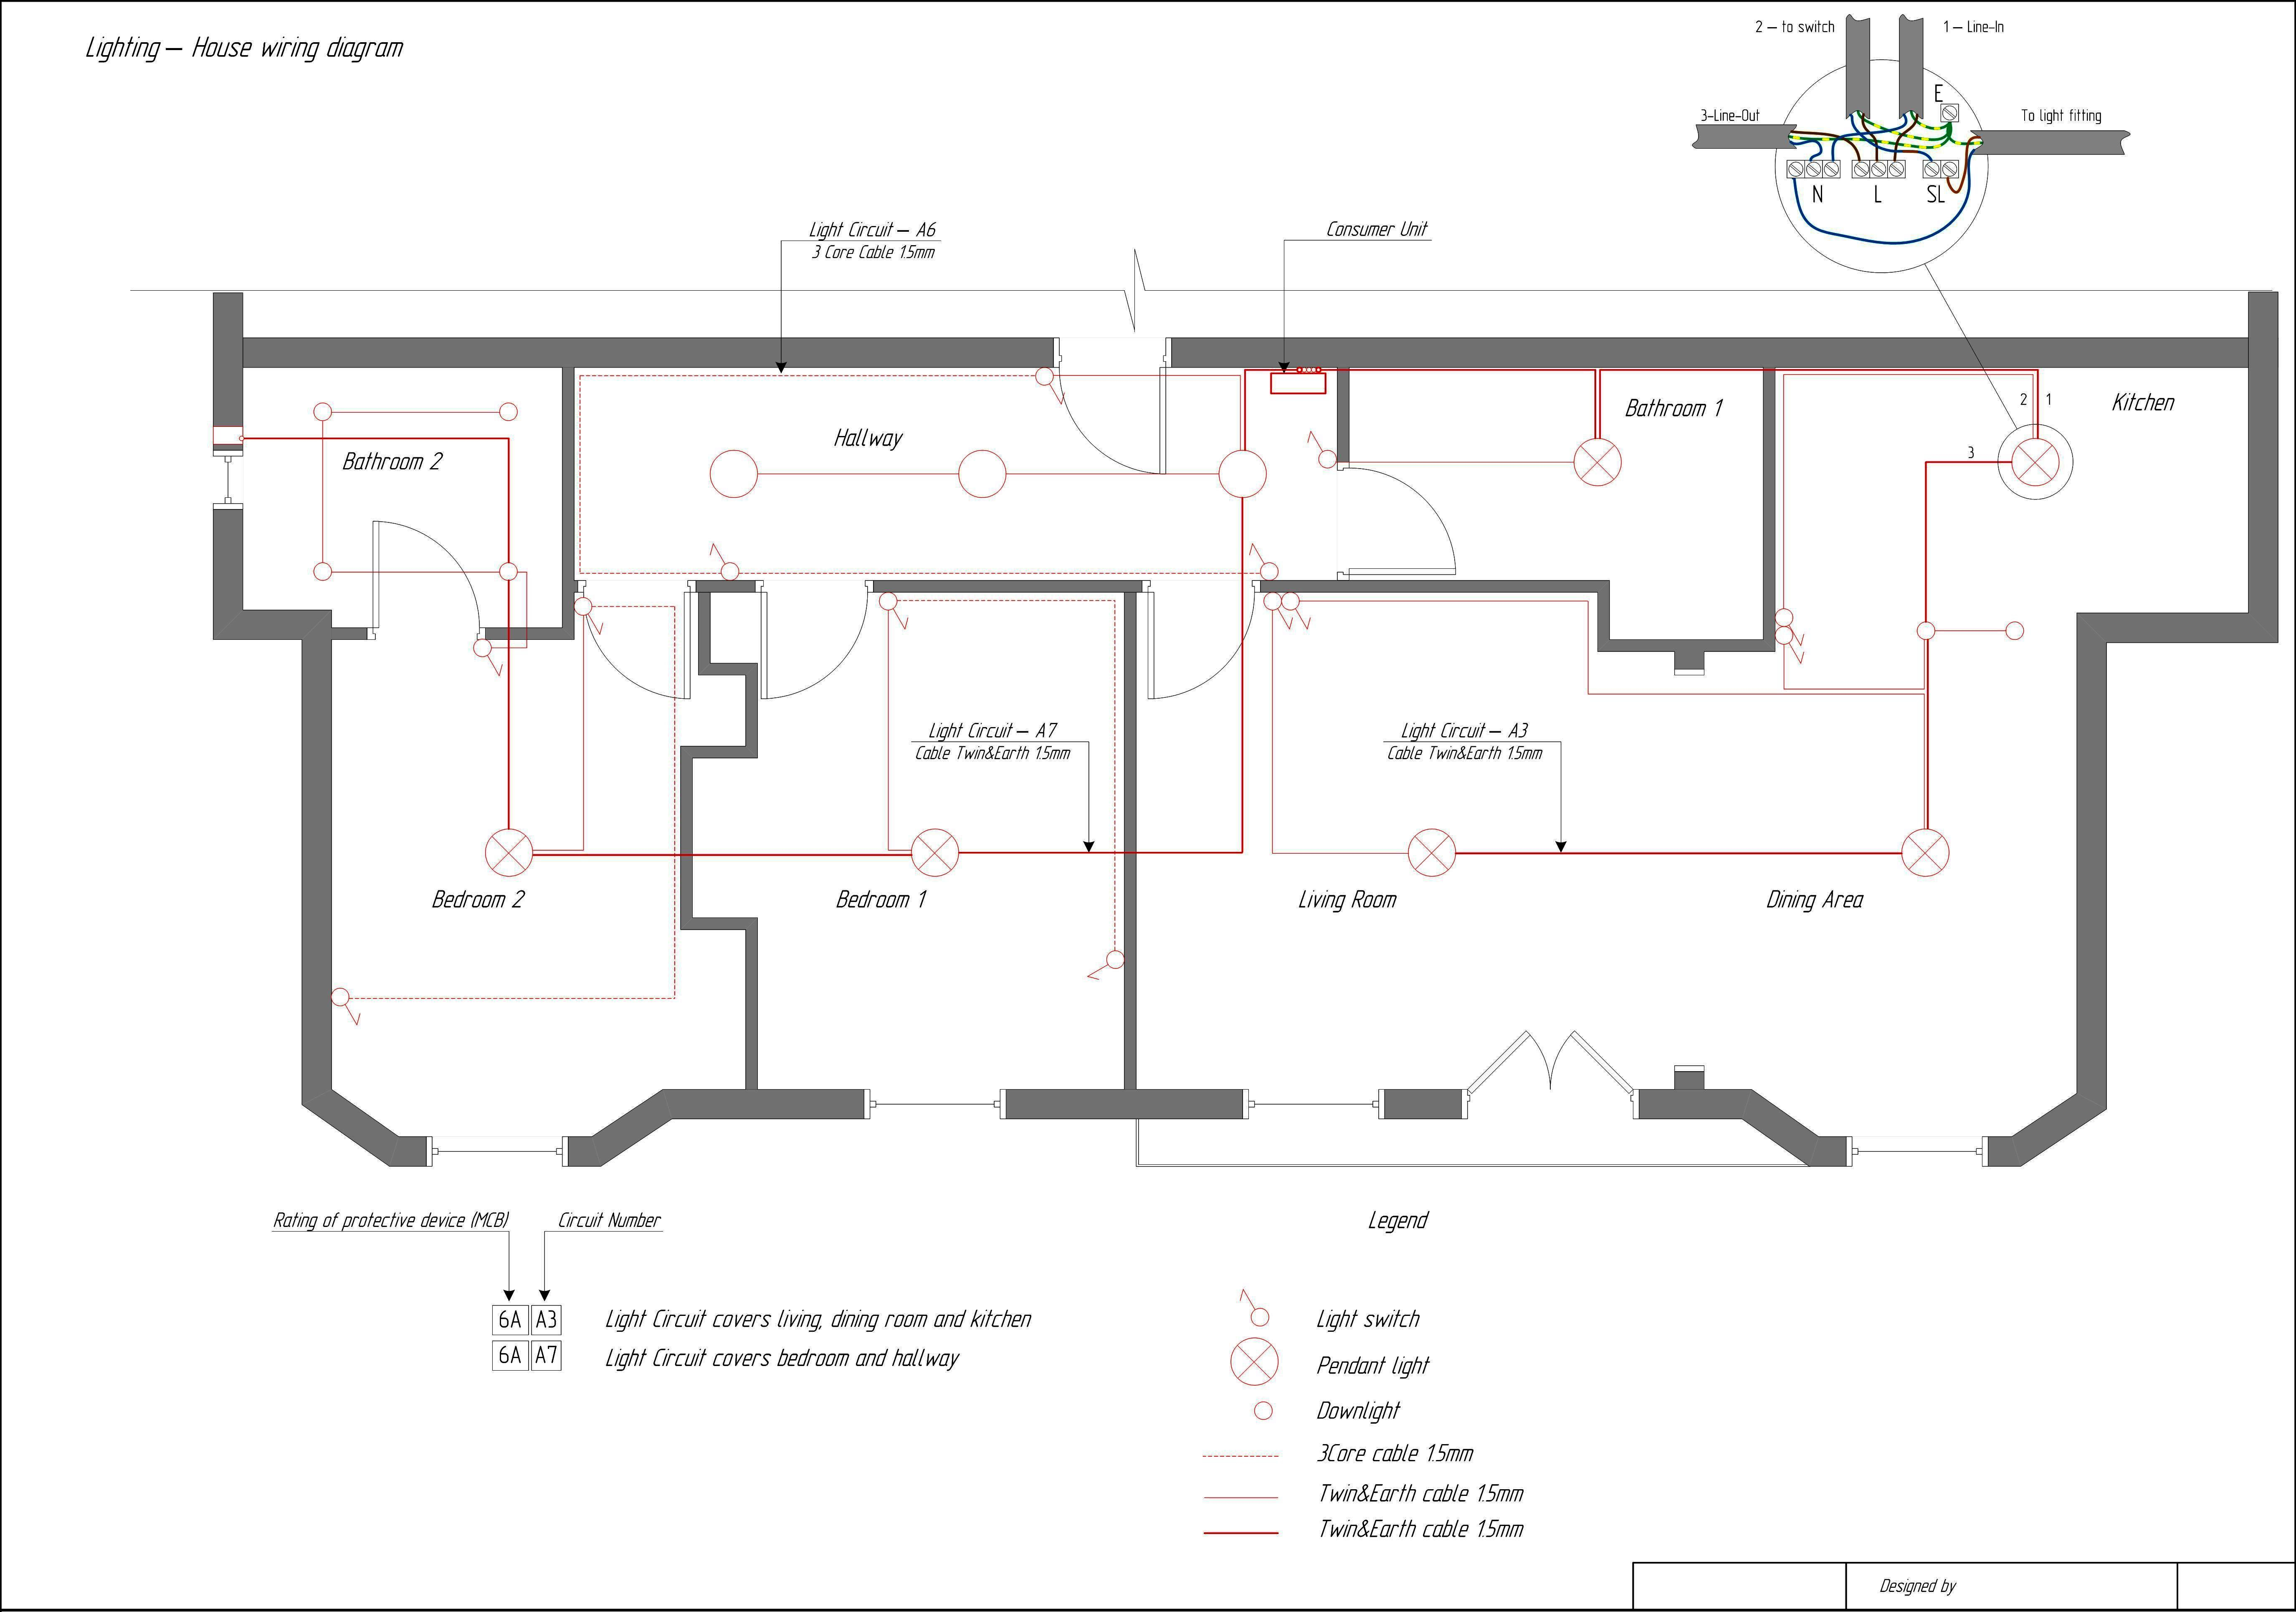 Uk House Electrical Wiring Diagrams | Wiring Diagram - House Electrical Wiring Diagram